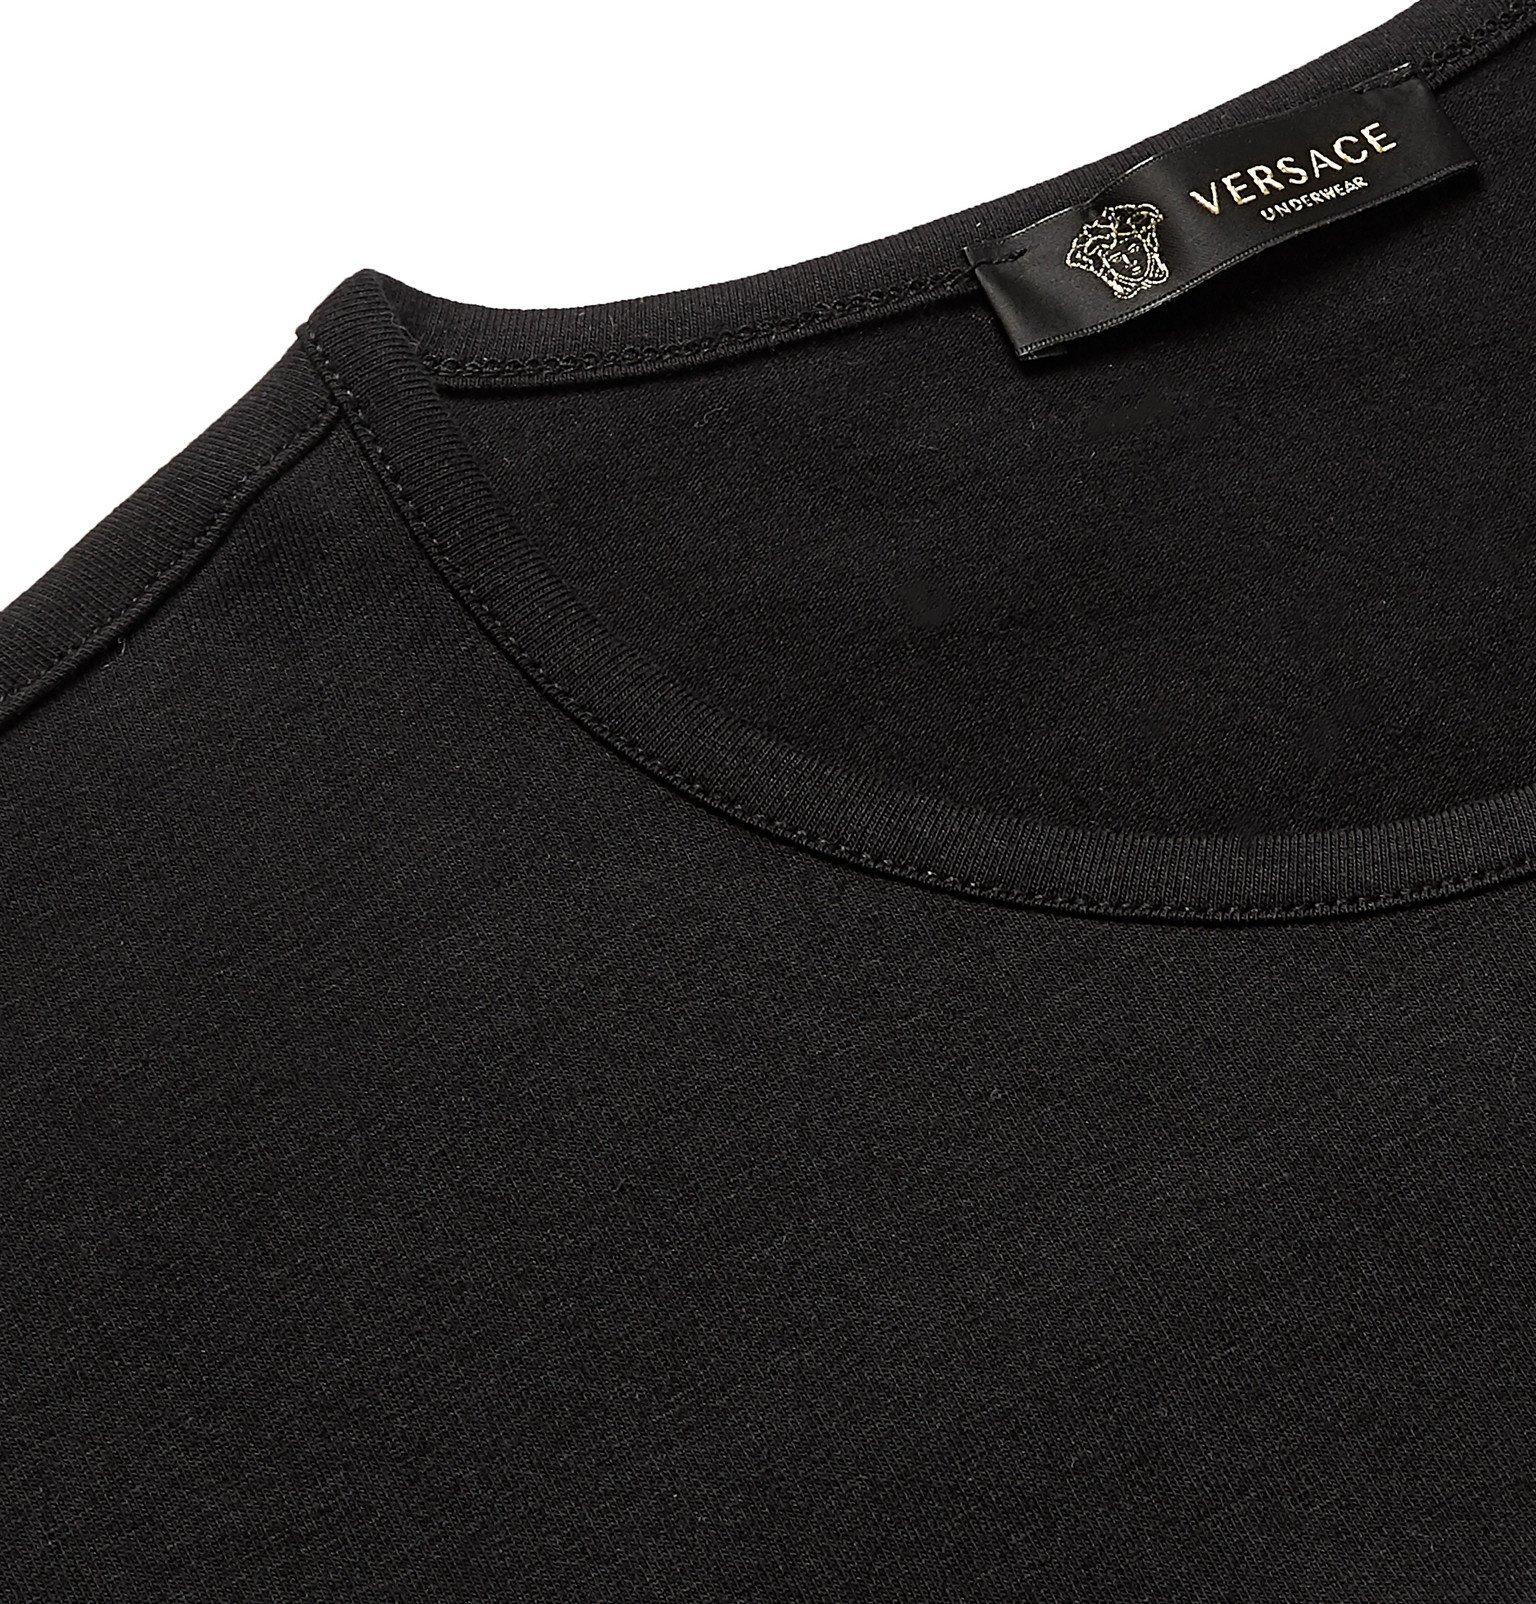 Versace - Two-Pack Slim-Fit Logo-Print Stretch-Cotton Jersey T-Shirts - Black